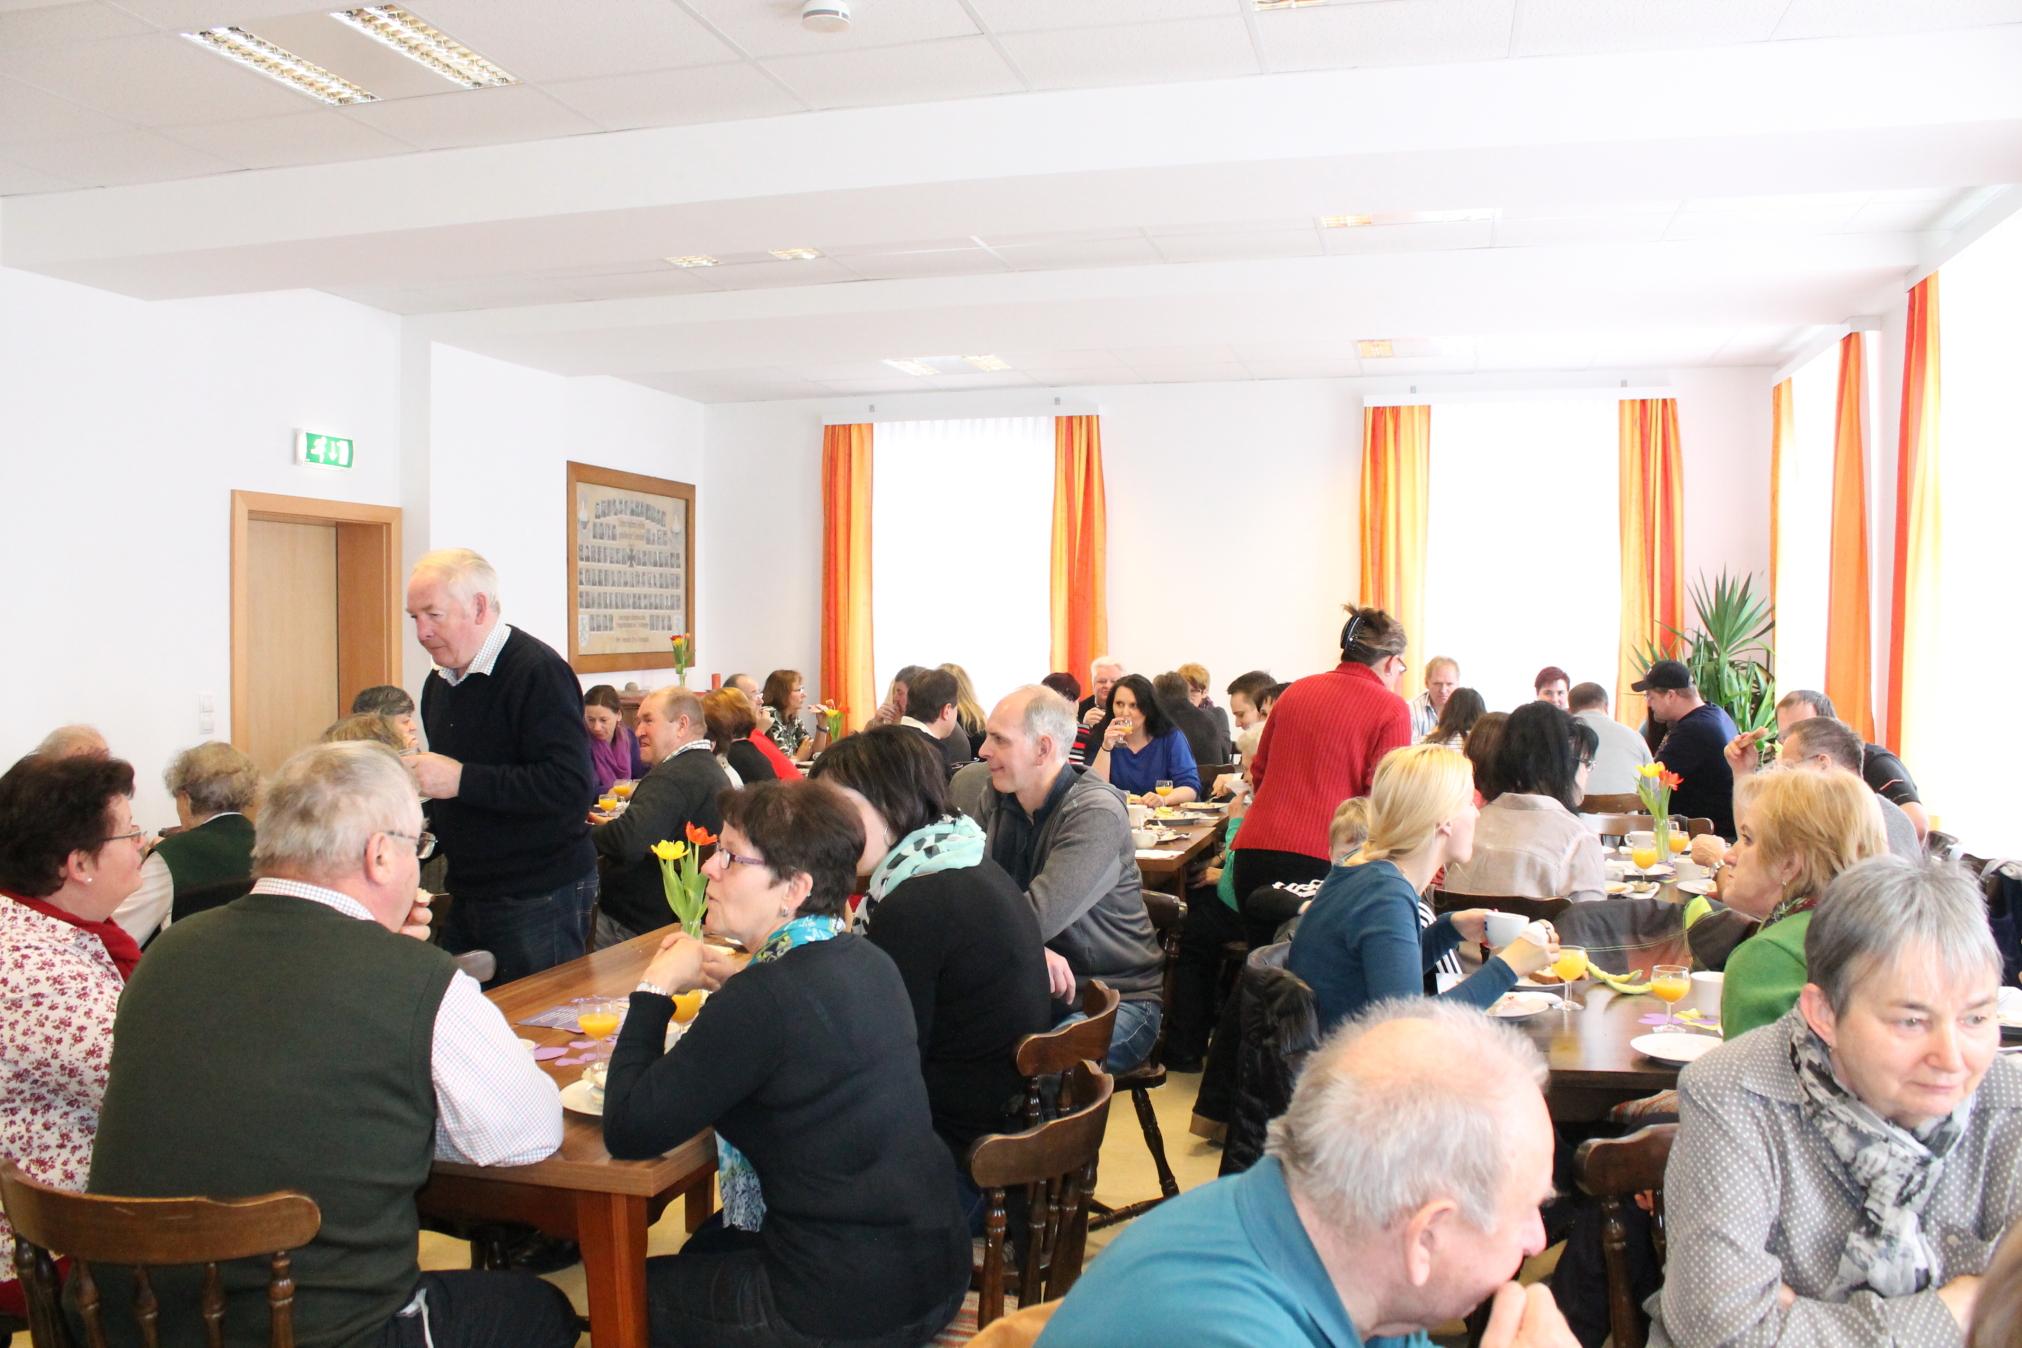 Beim Frühstück im Gespräch im Cafè Rosi